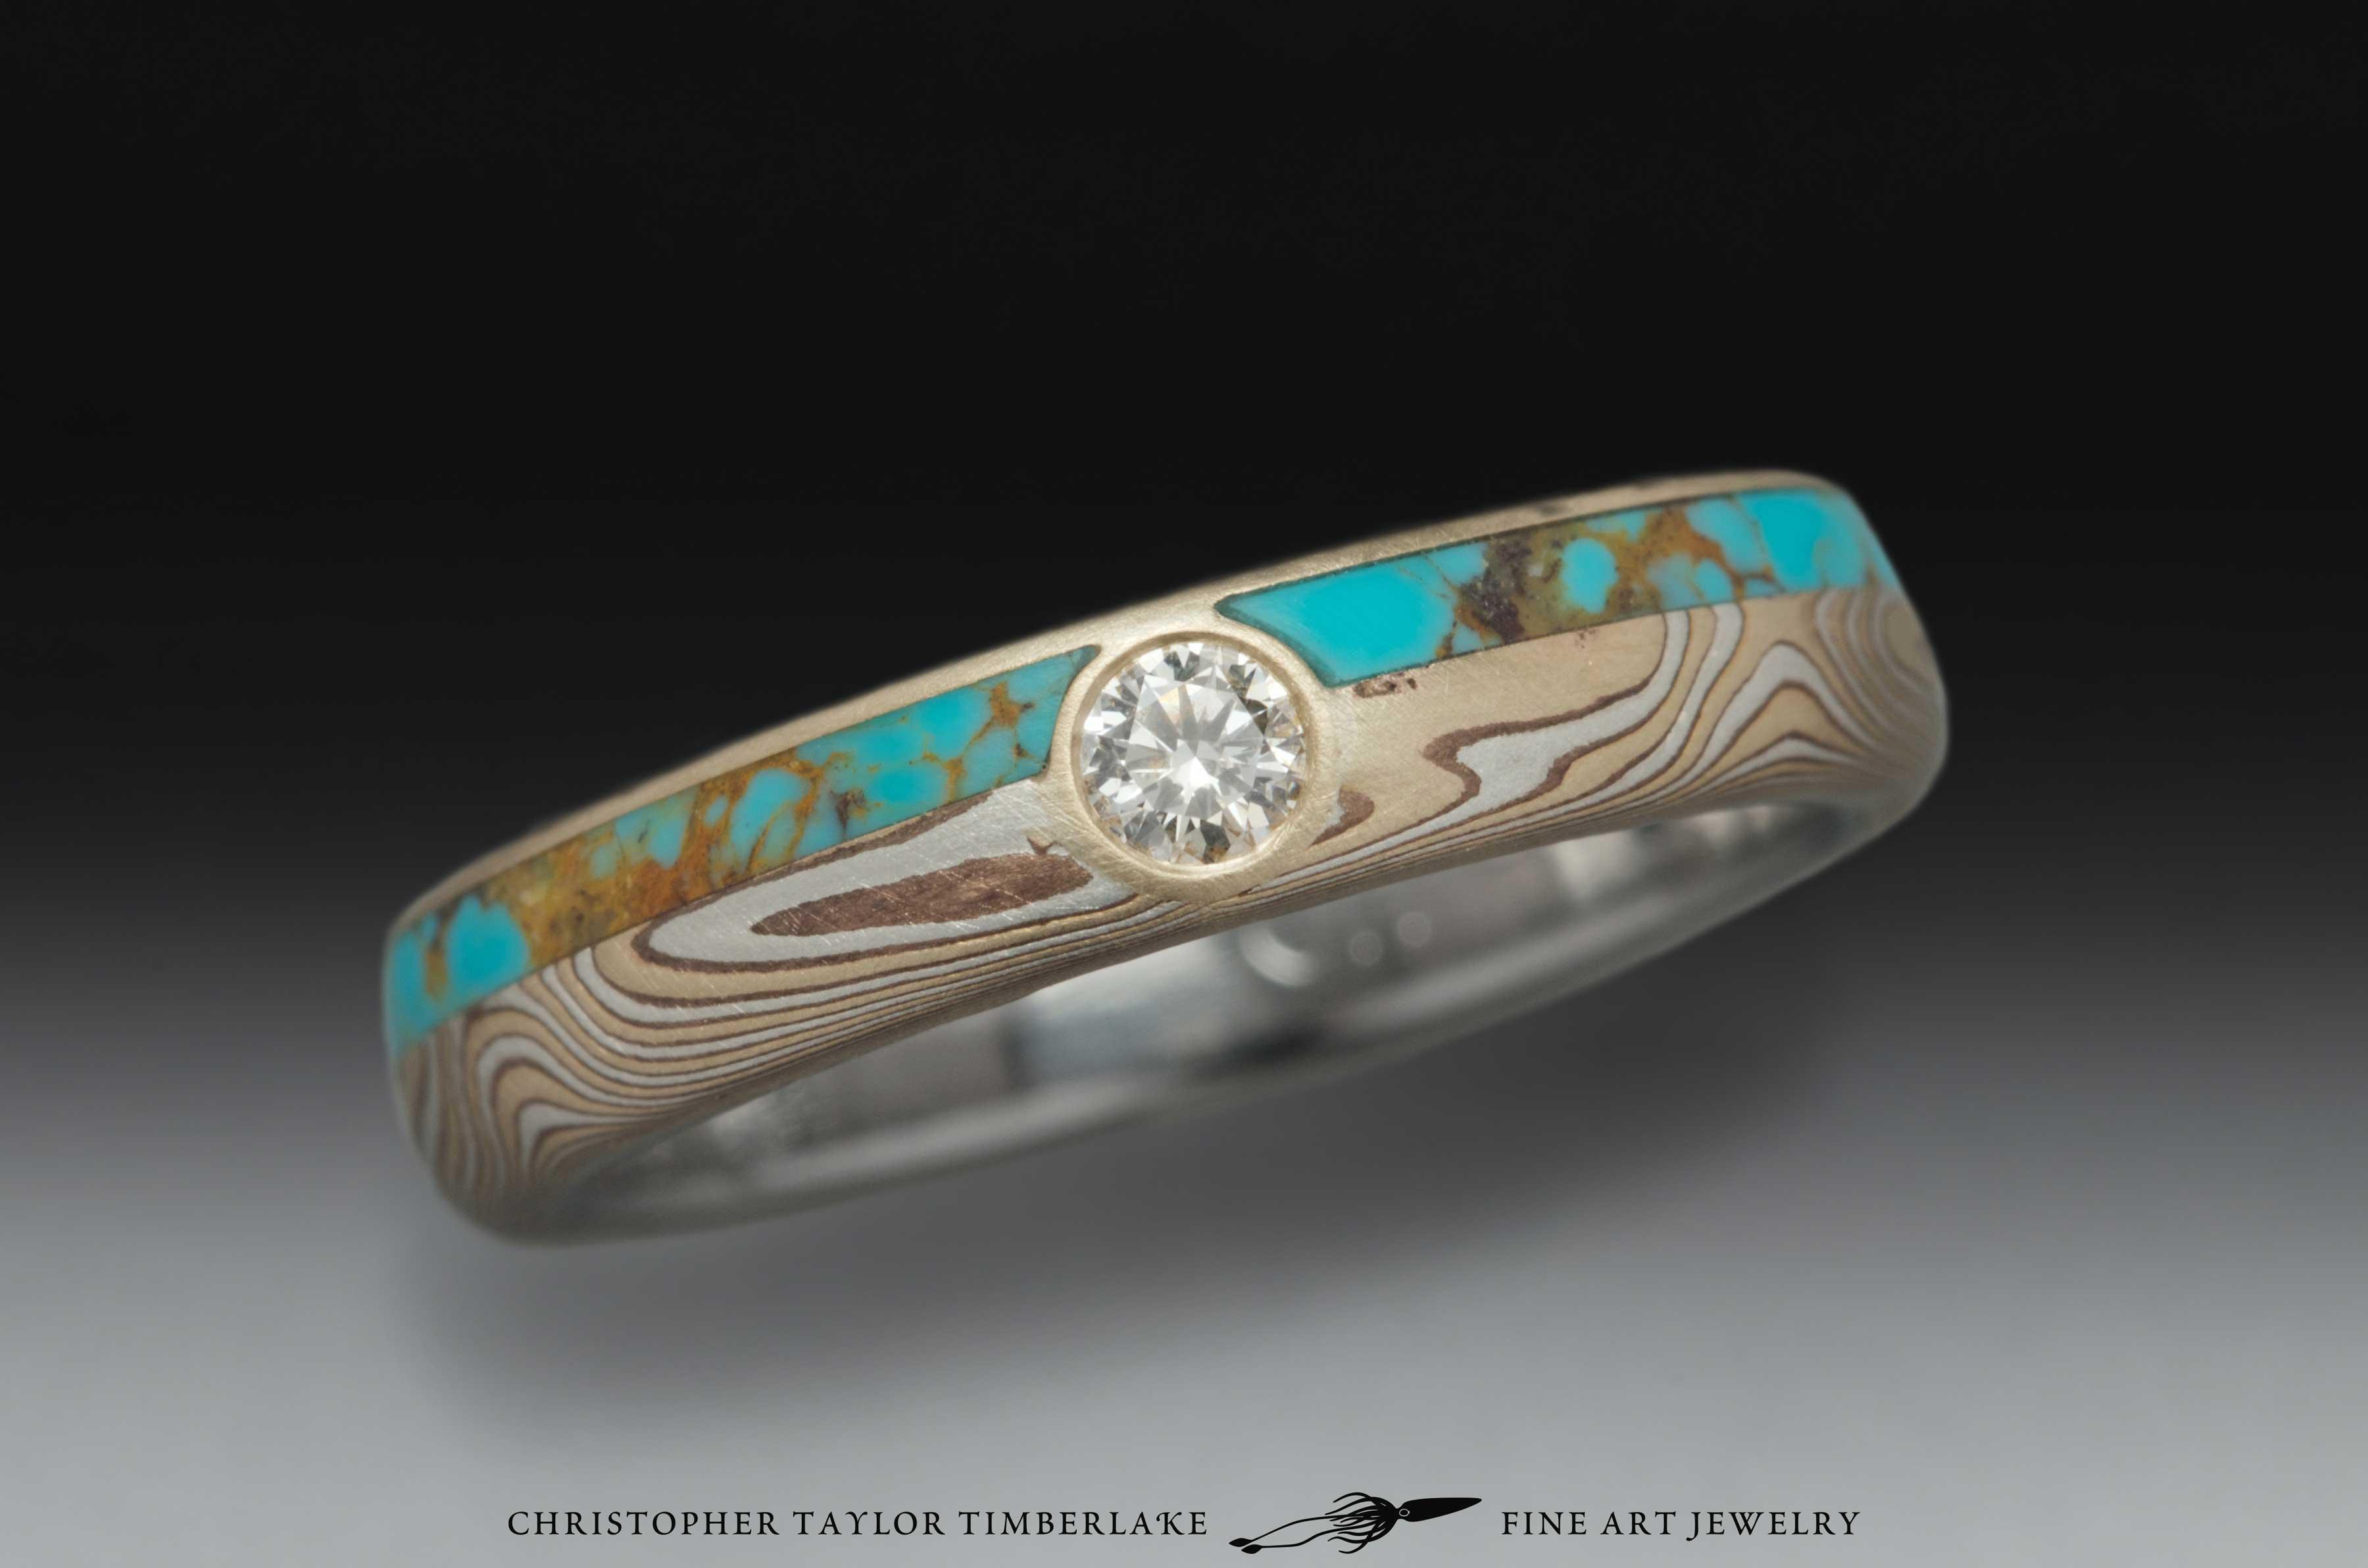 Mokume-Gane-Ring-(M95)-14K-karat-yellow-gold,-sterling-silver,-shakudo,-turquoise-inlay,-bezel-flush-set-diamond-3mm,-4.5-(2.5-1.5-.5)-domed,-woodgrain,-etched,-stainless-steel-inner-band-5